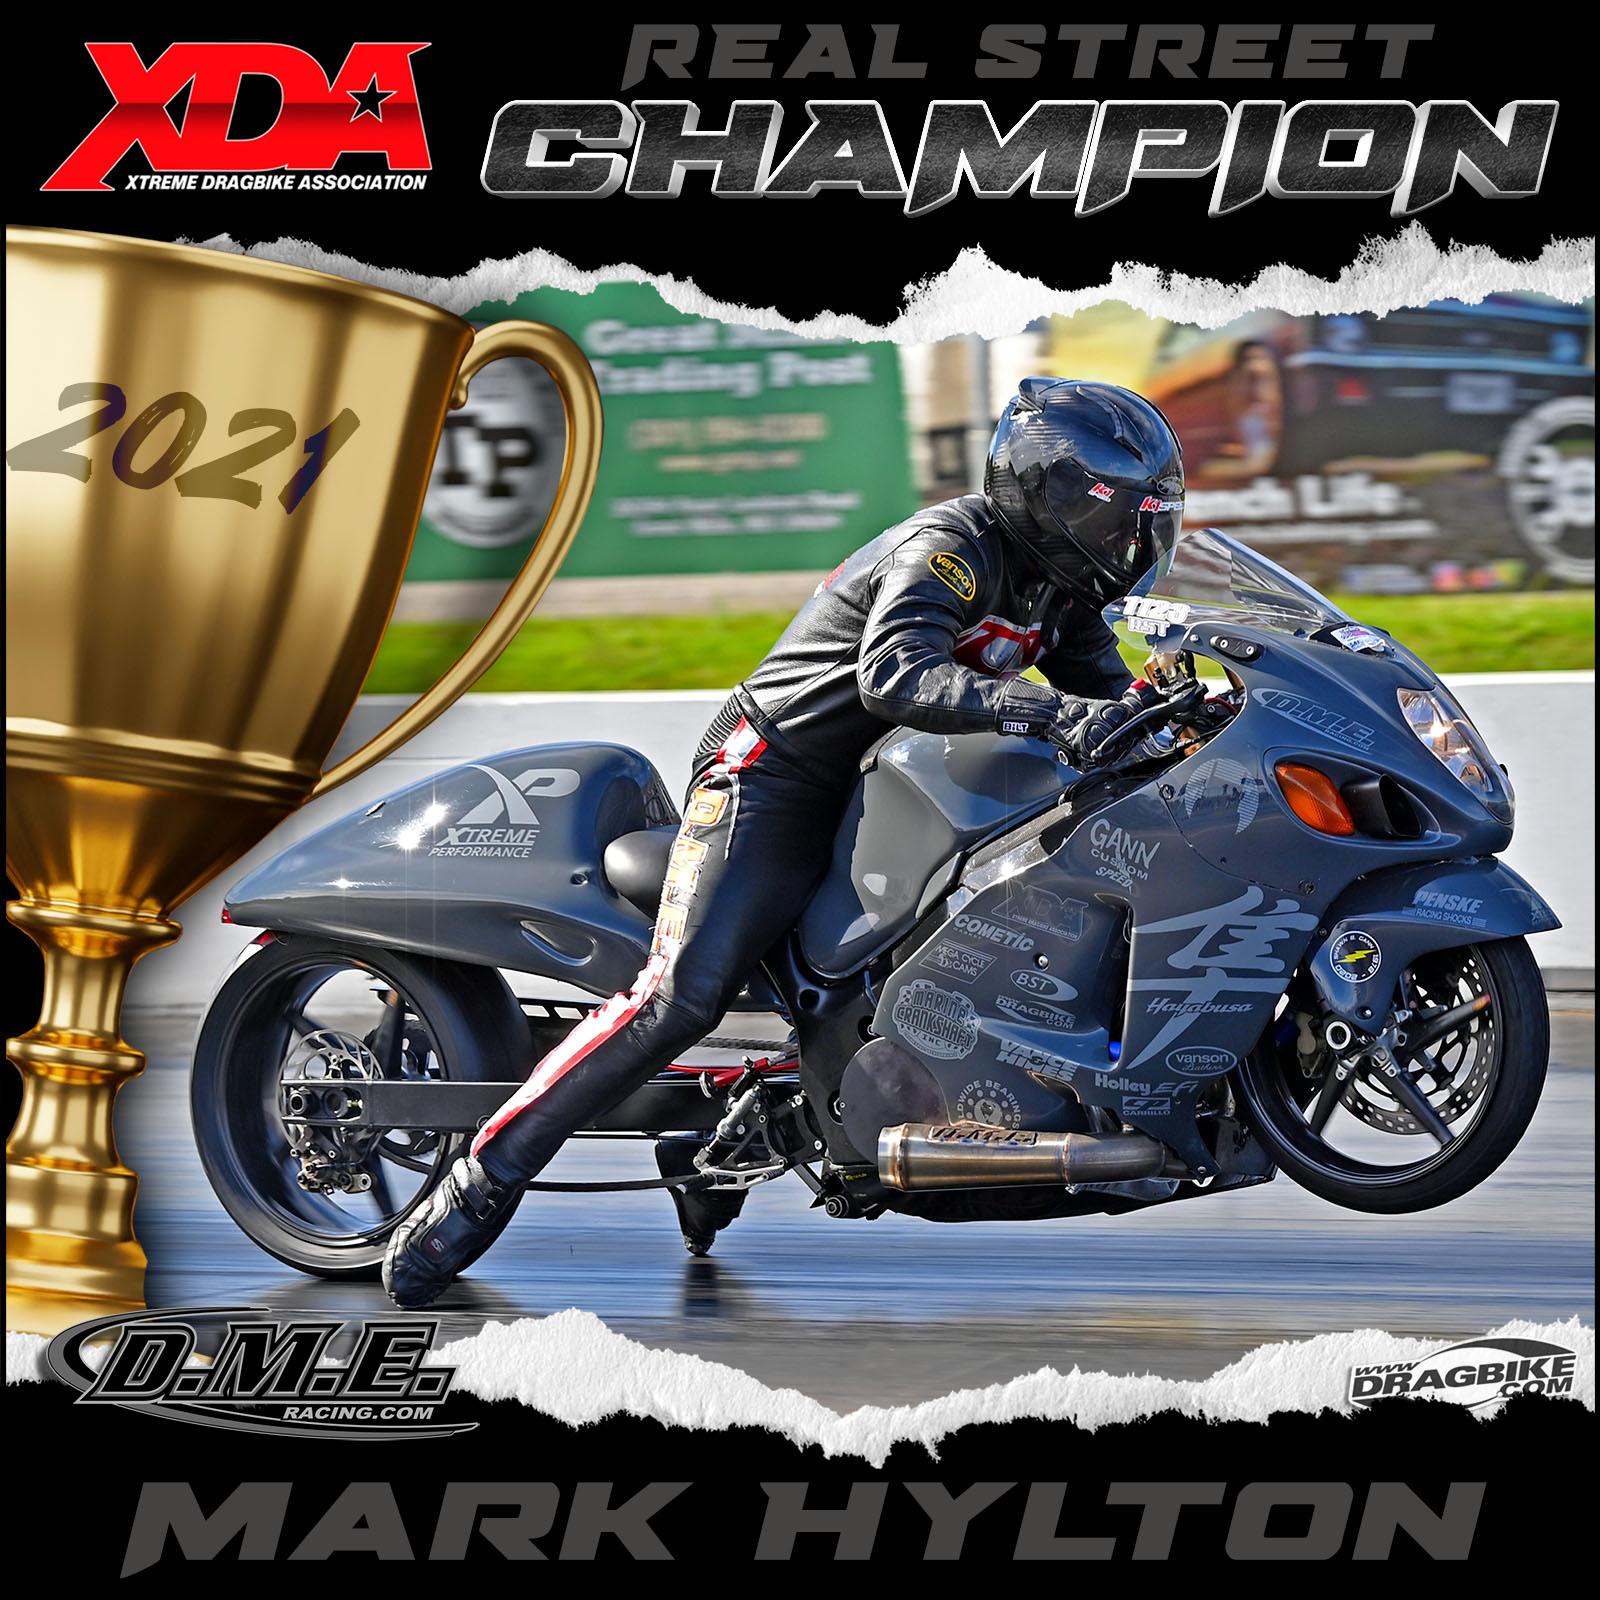 XDA 2021 Champion Mark Hylton